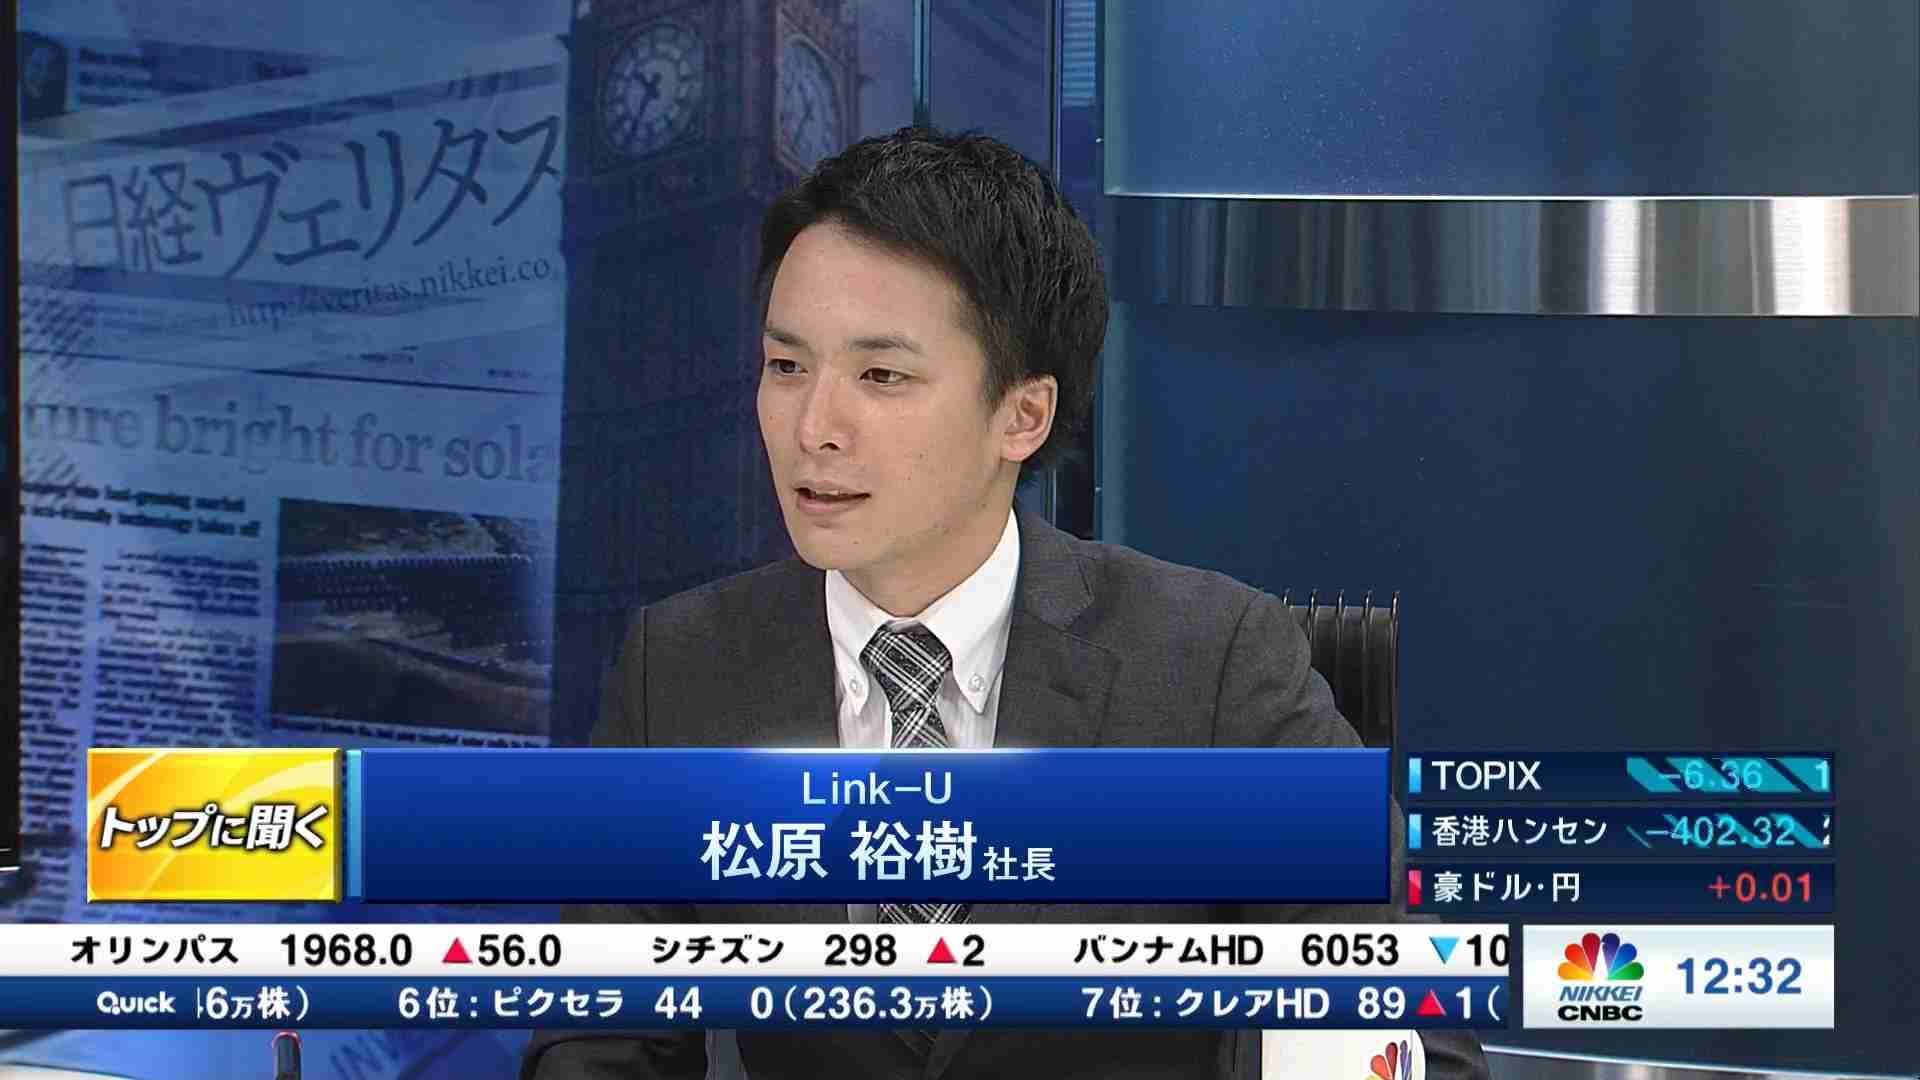 株価 link u